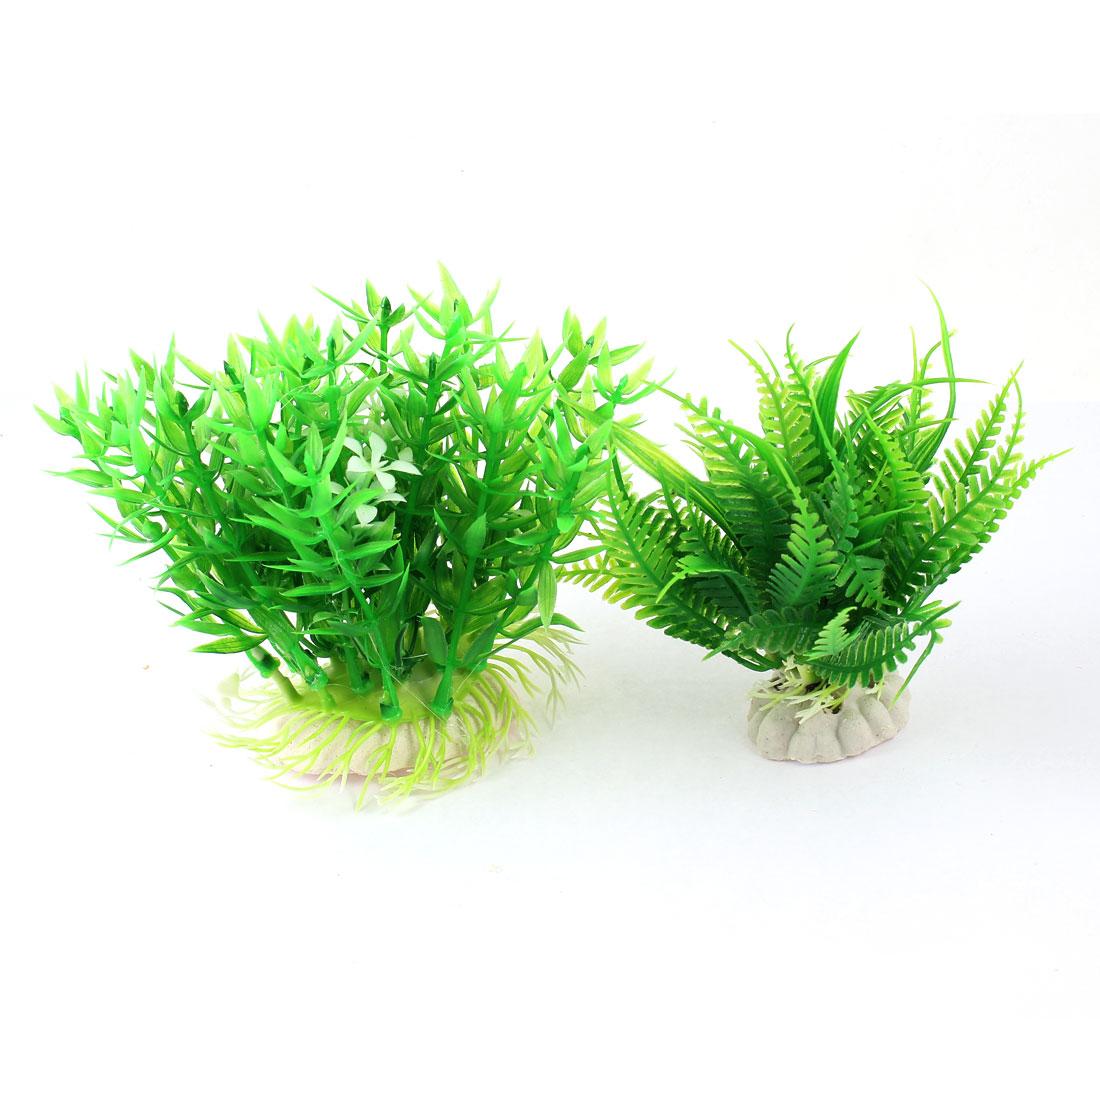 Unique Bargains Aquariums Decoration Green White Emulational Plastic Grass Plants 2 in 1